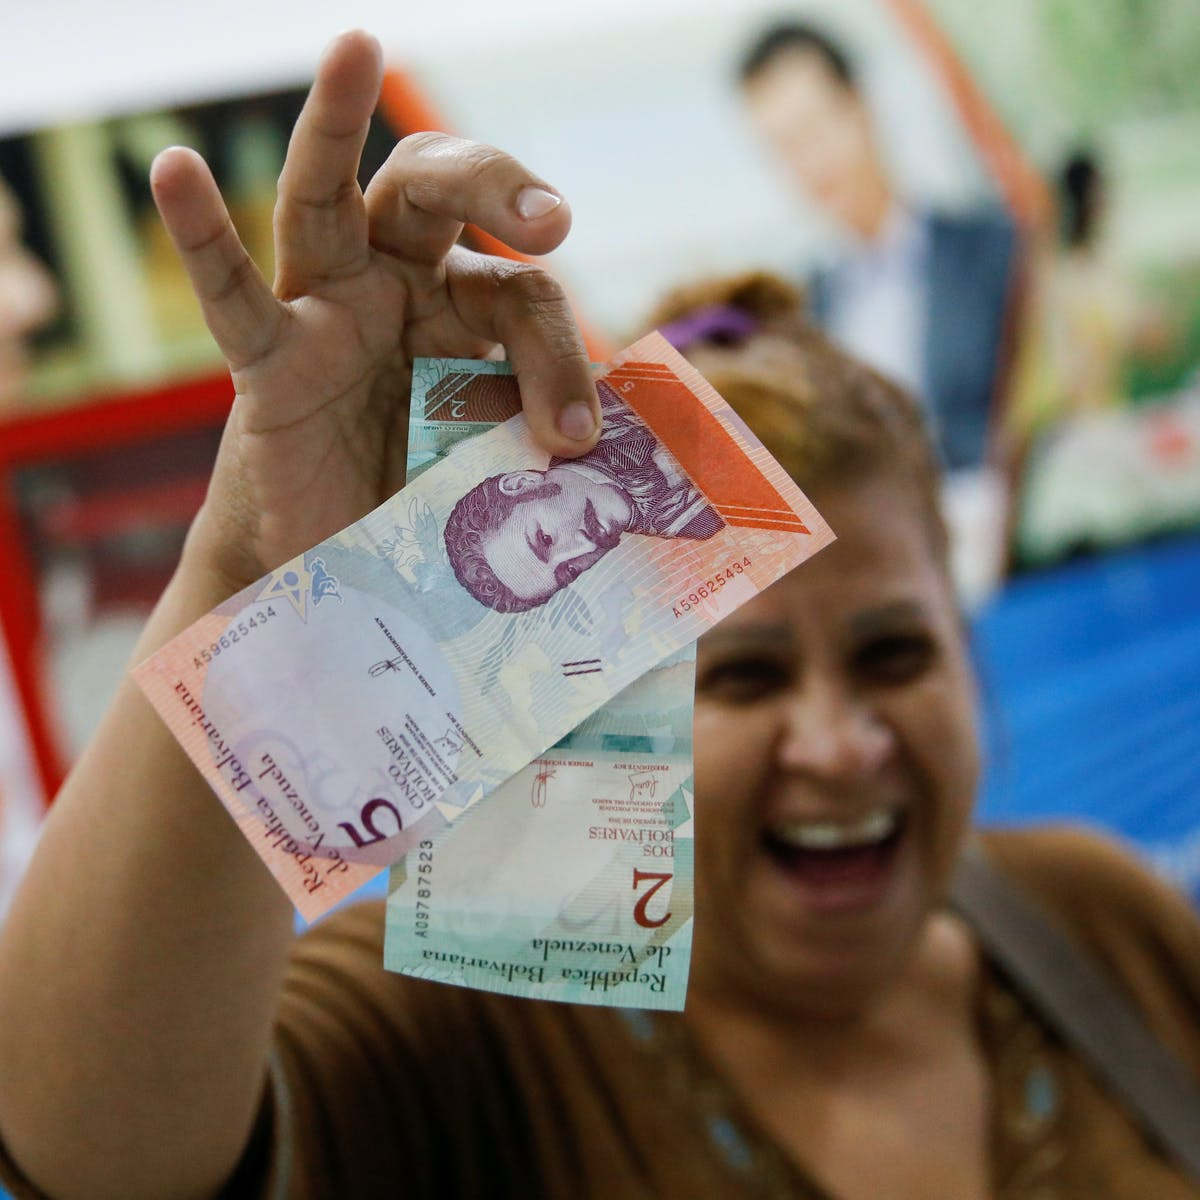 Venezuela's 'desperate' currency devaluation won't save its economy